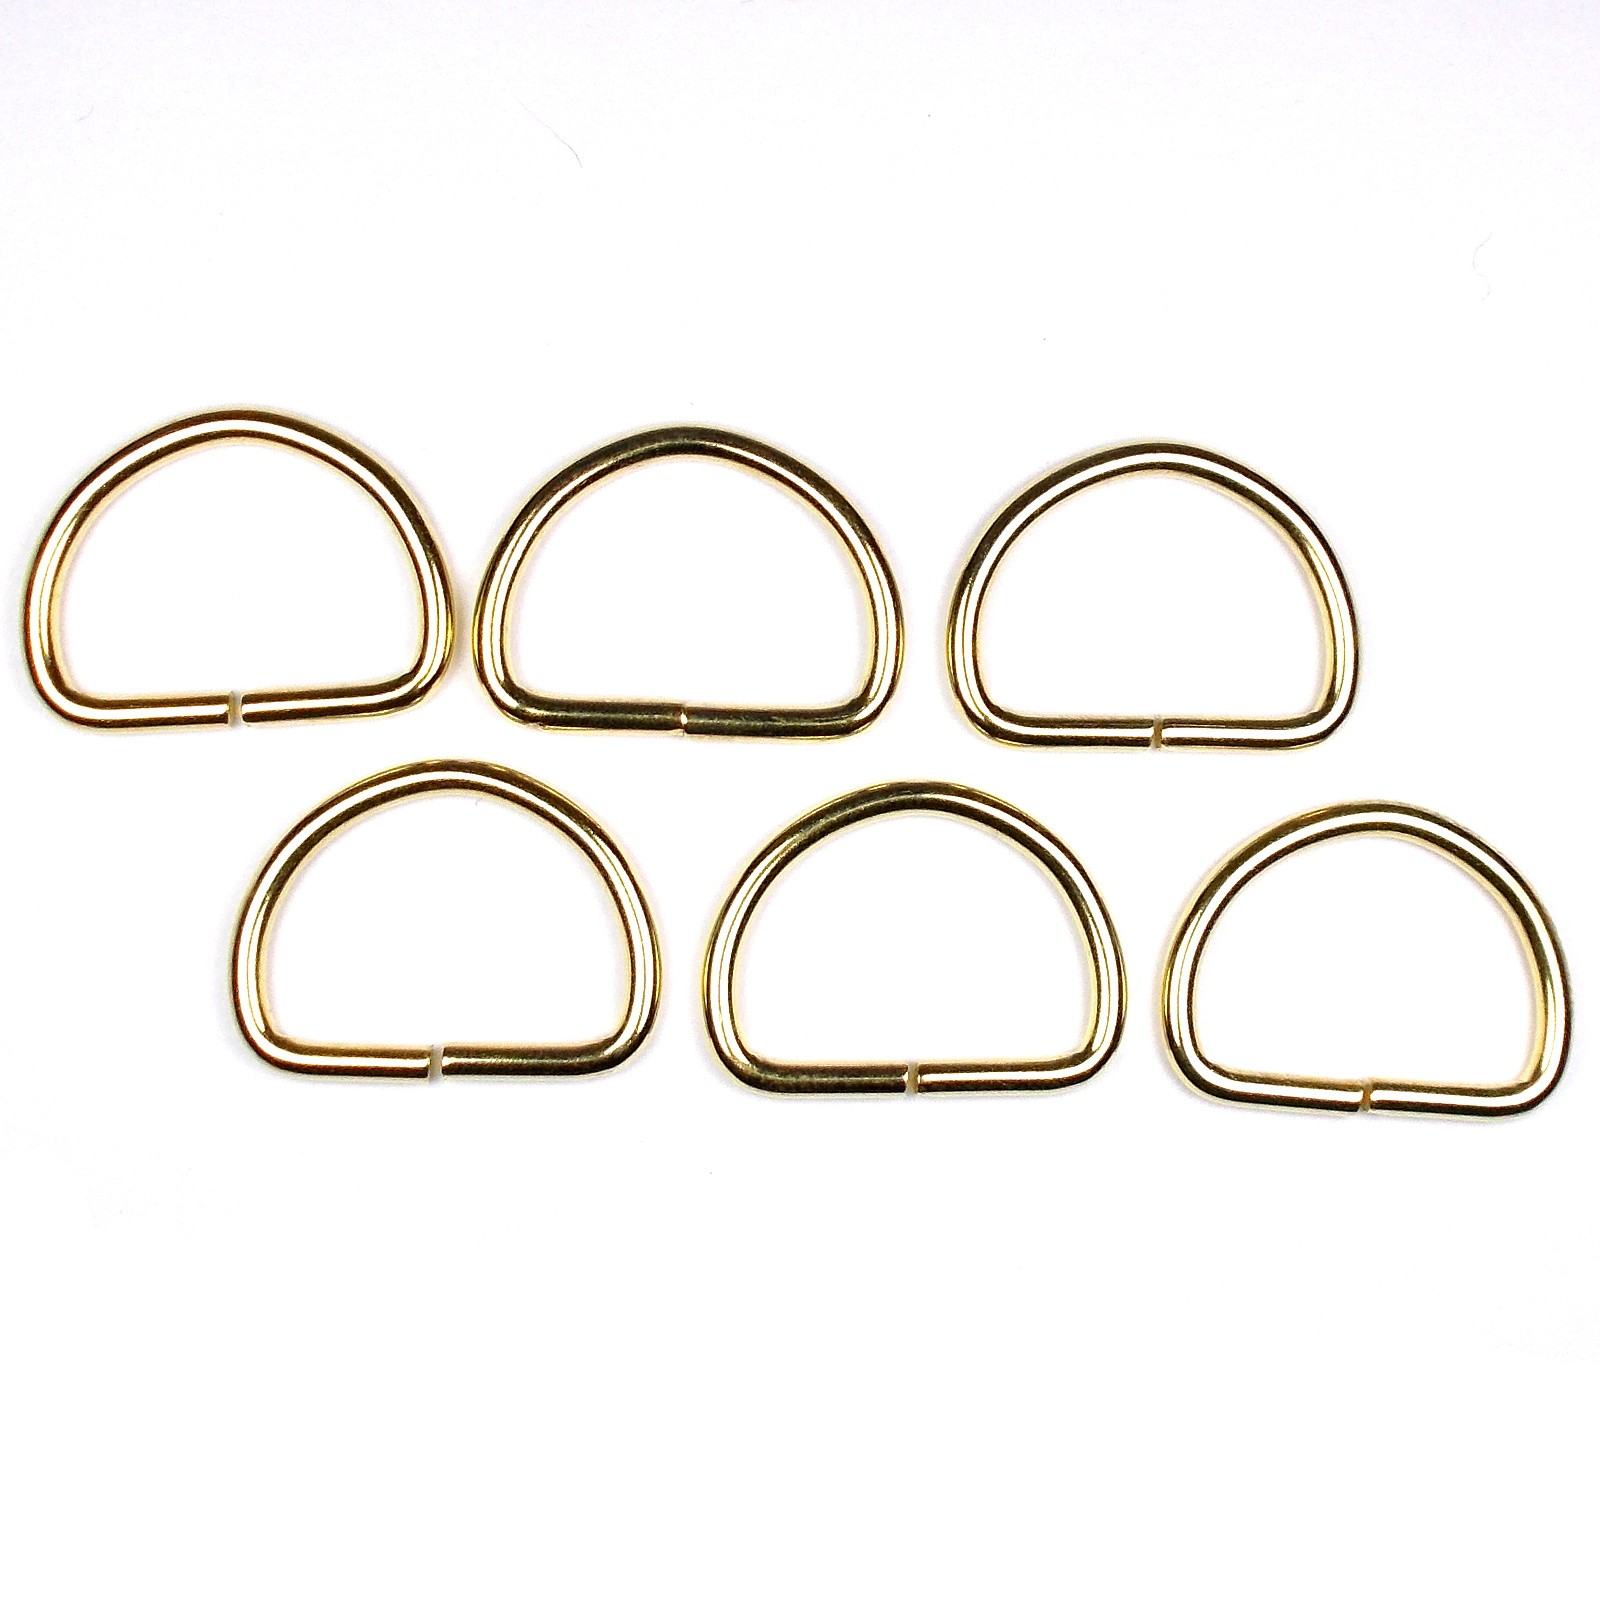 Gold Metal D Rings 47mm Pack of 6